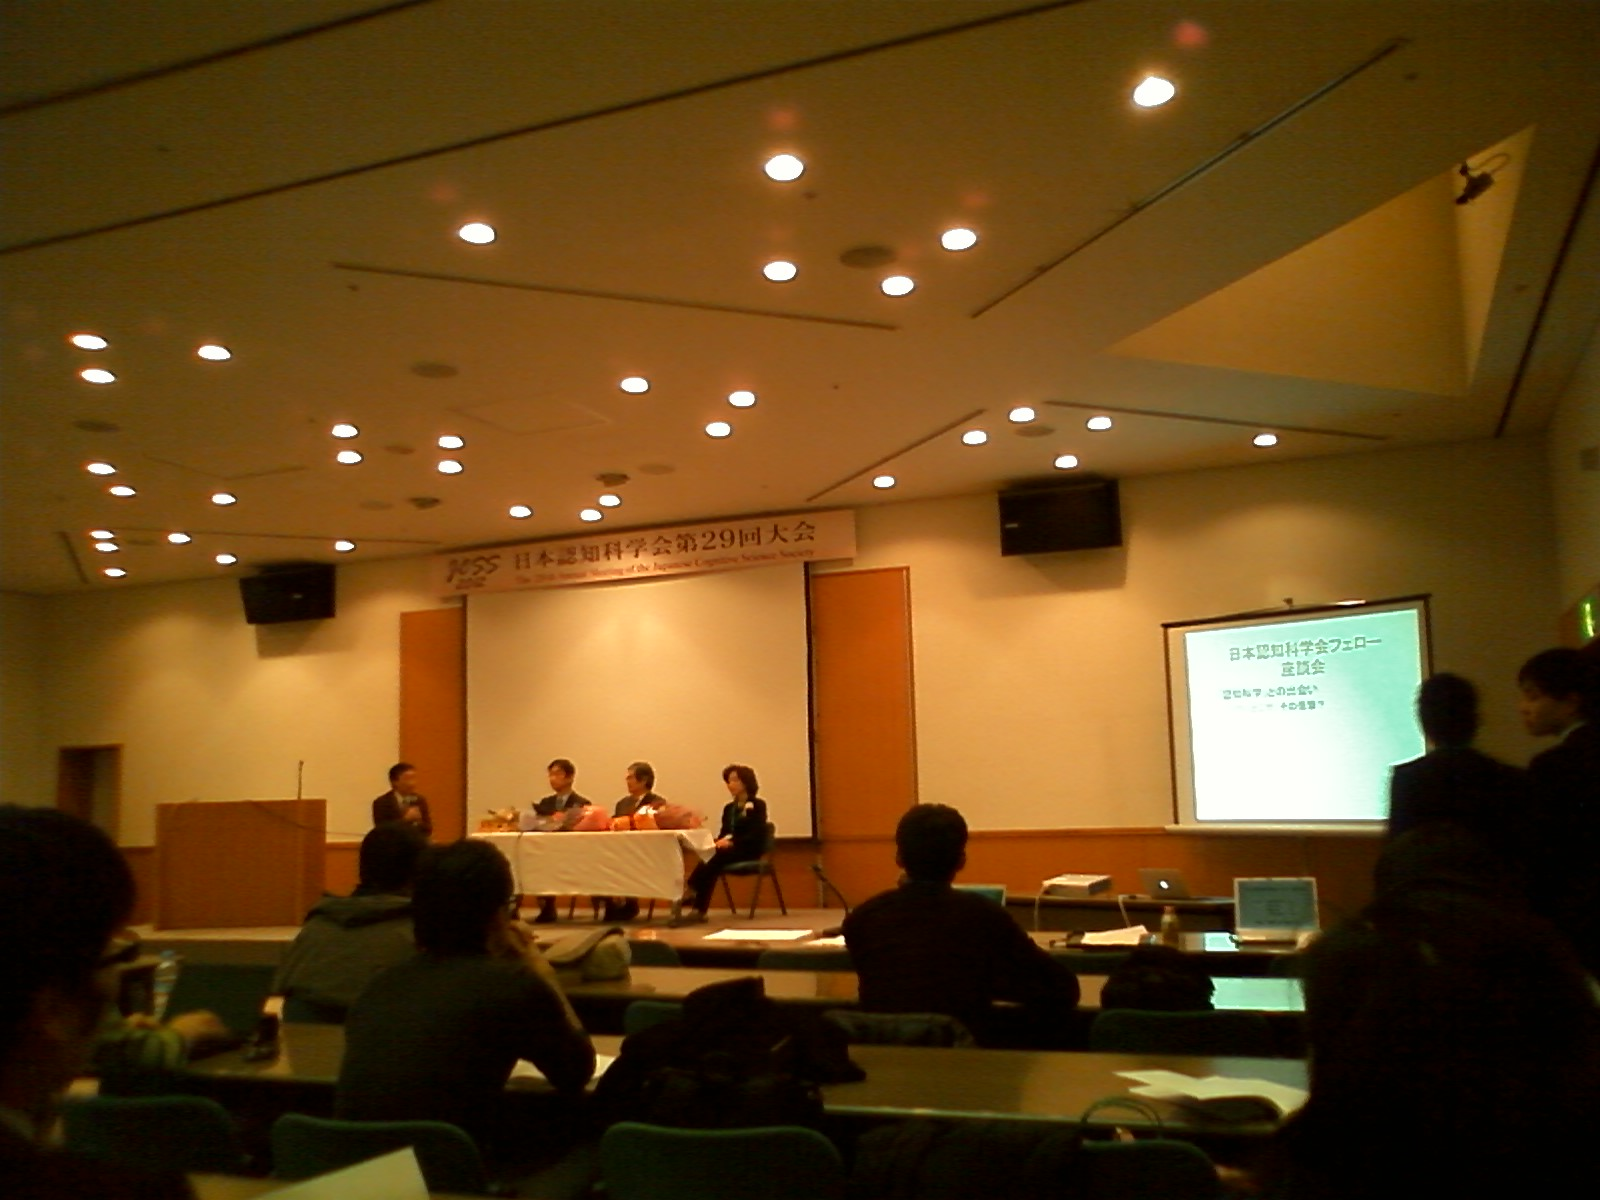 NAL's blog @ 琉球大学情報工学科 » イベントレポート